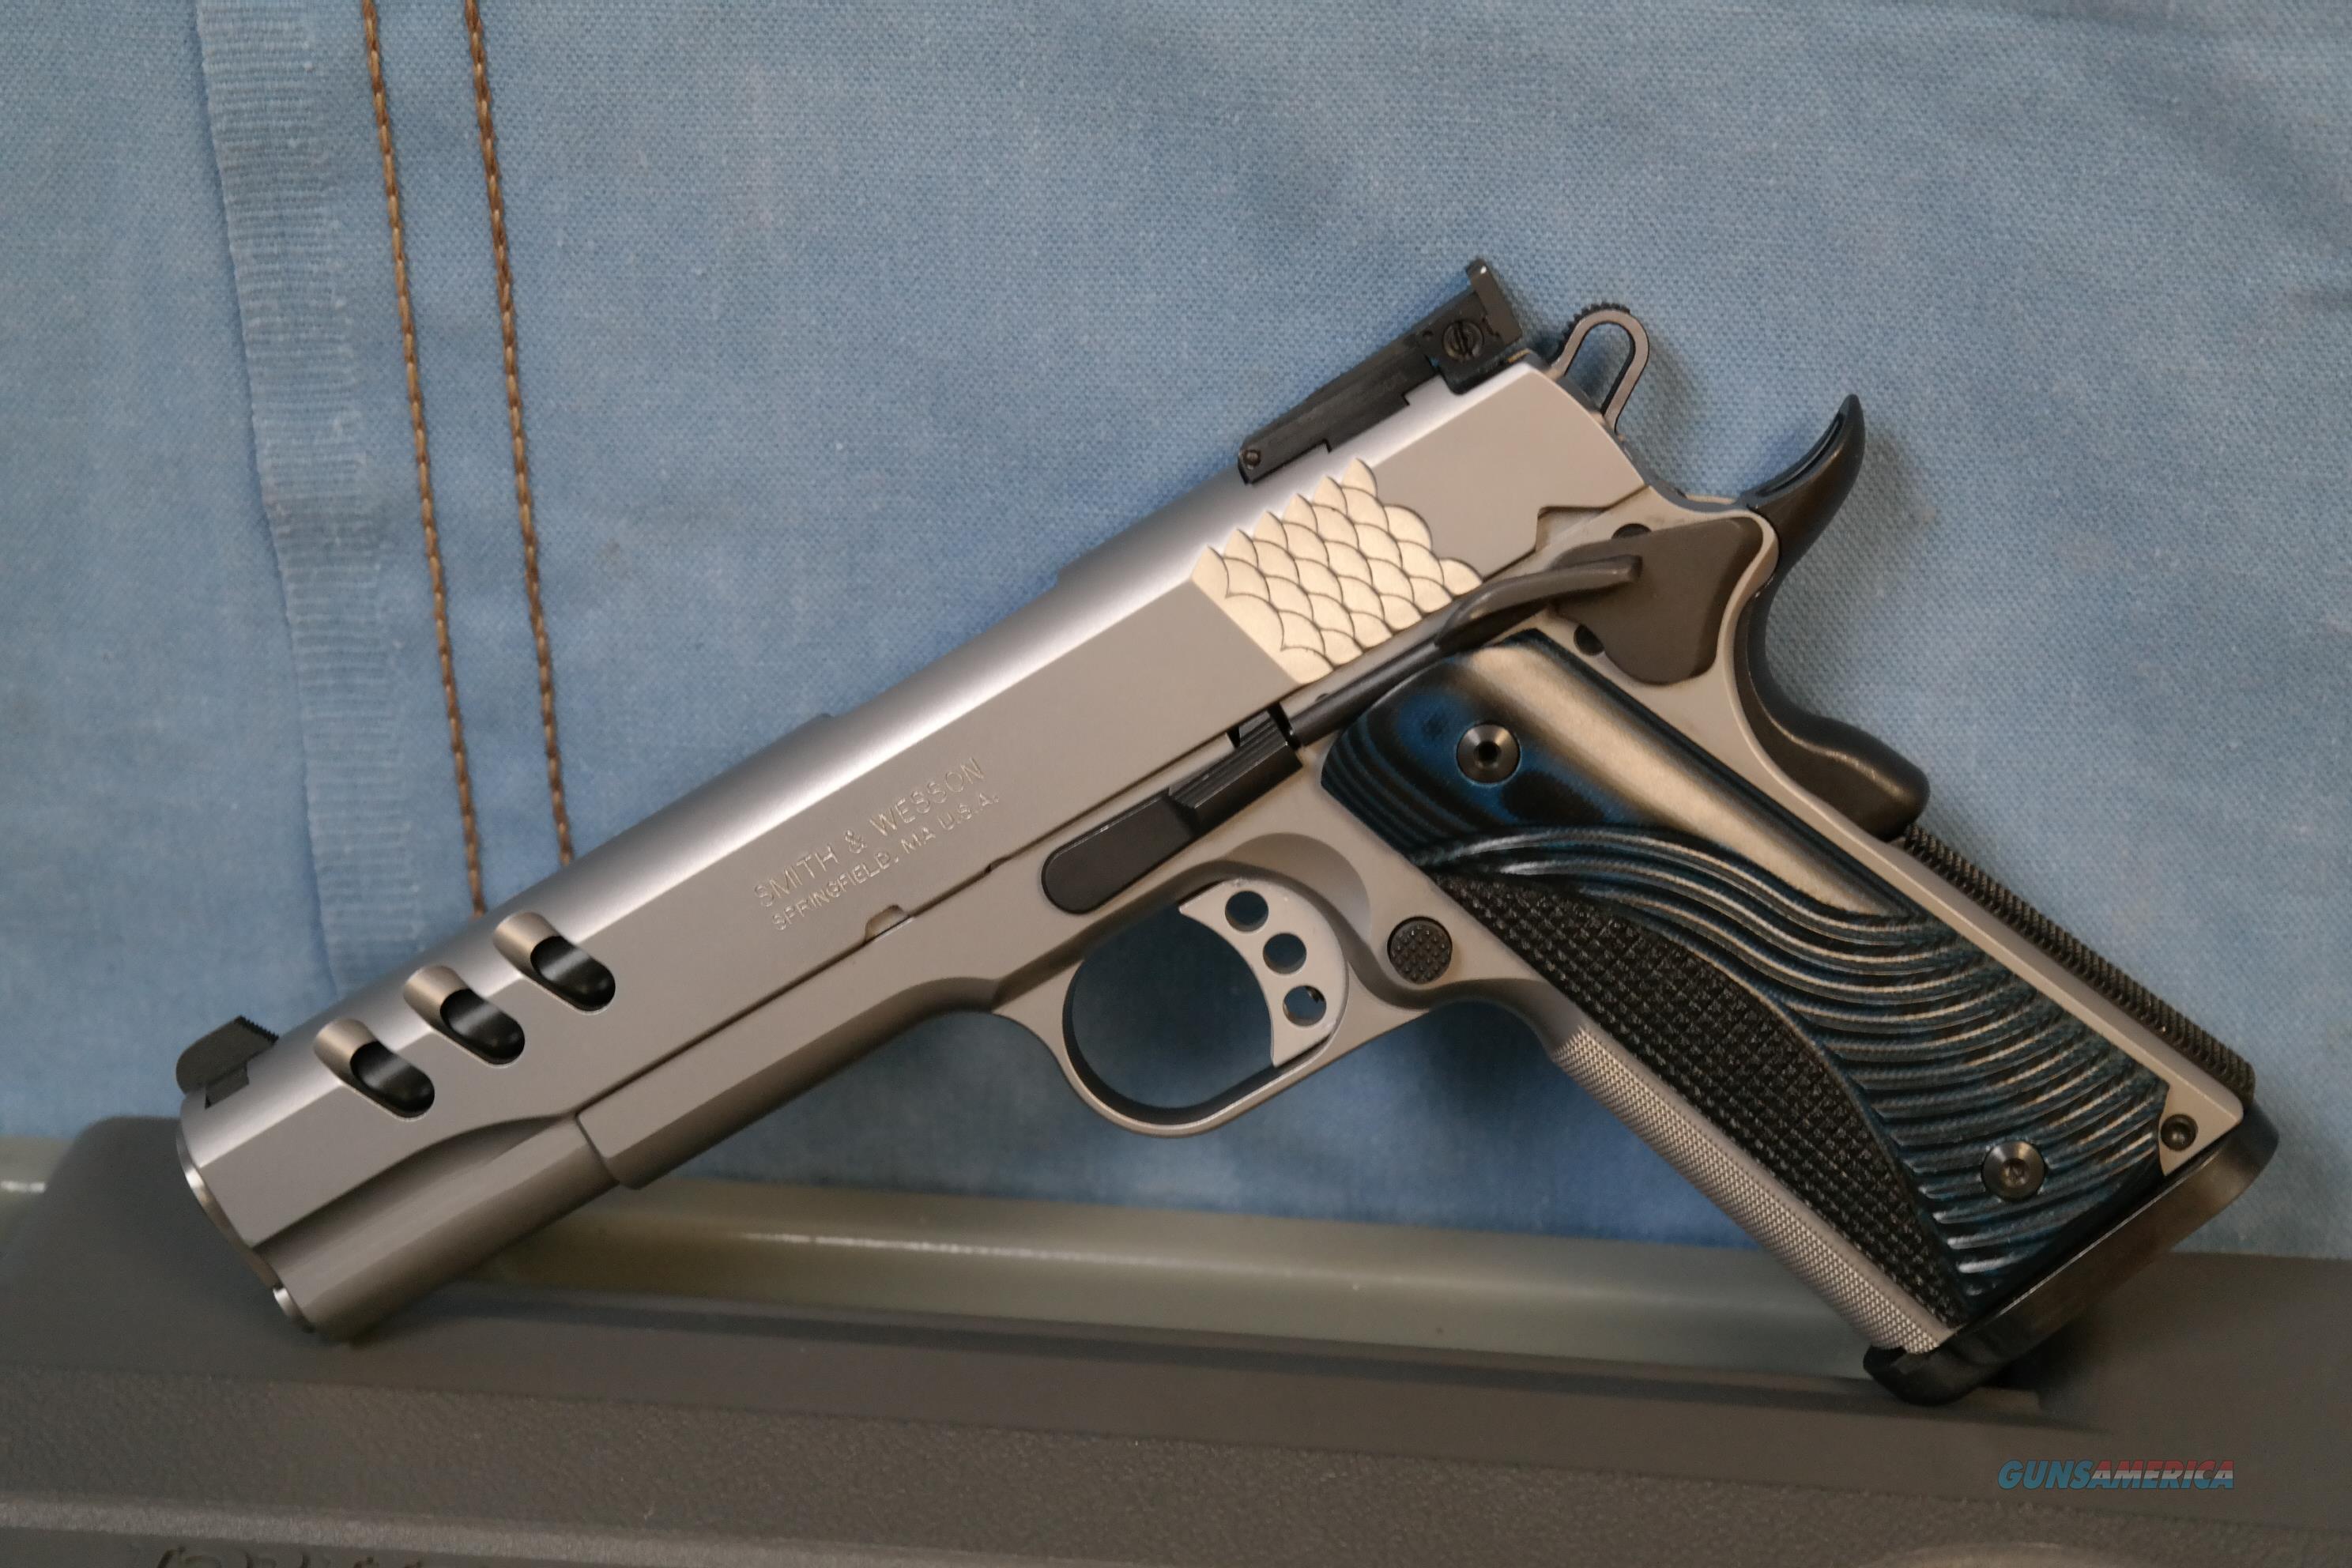 S&W 170343 Performance Center 1911 Ported Slide  Guns > Pistols > Smith & Wesson Pistols - Autos > Steel Frame